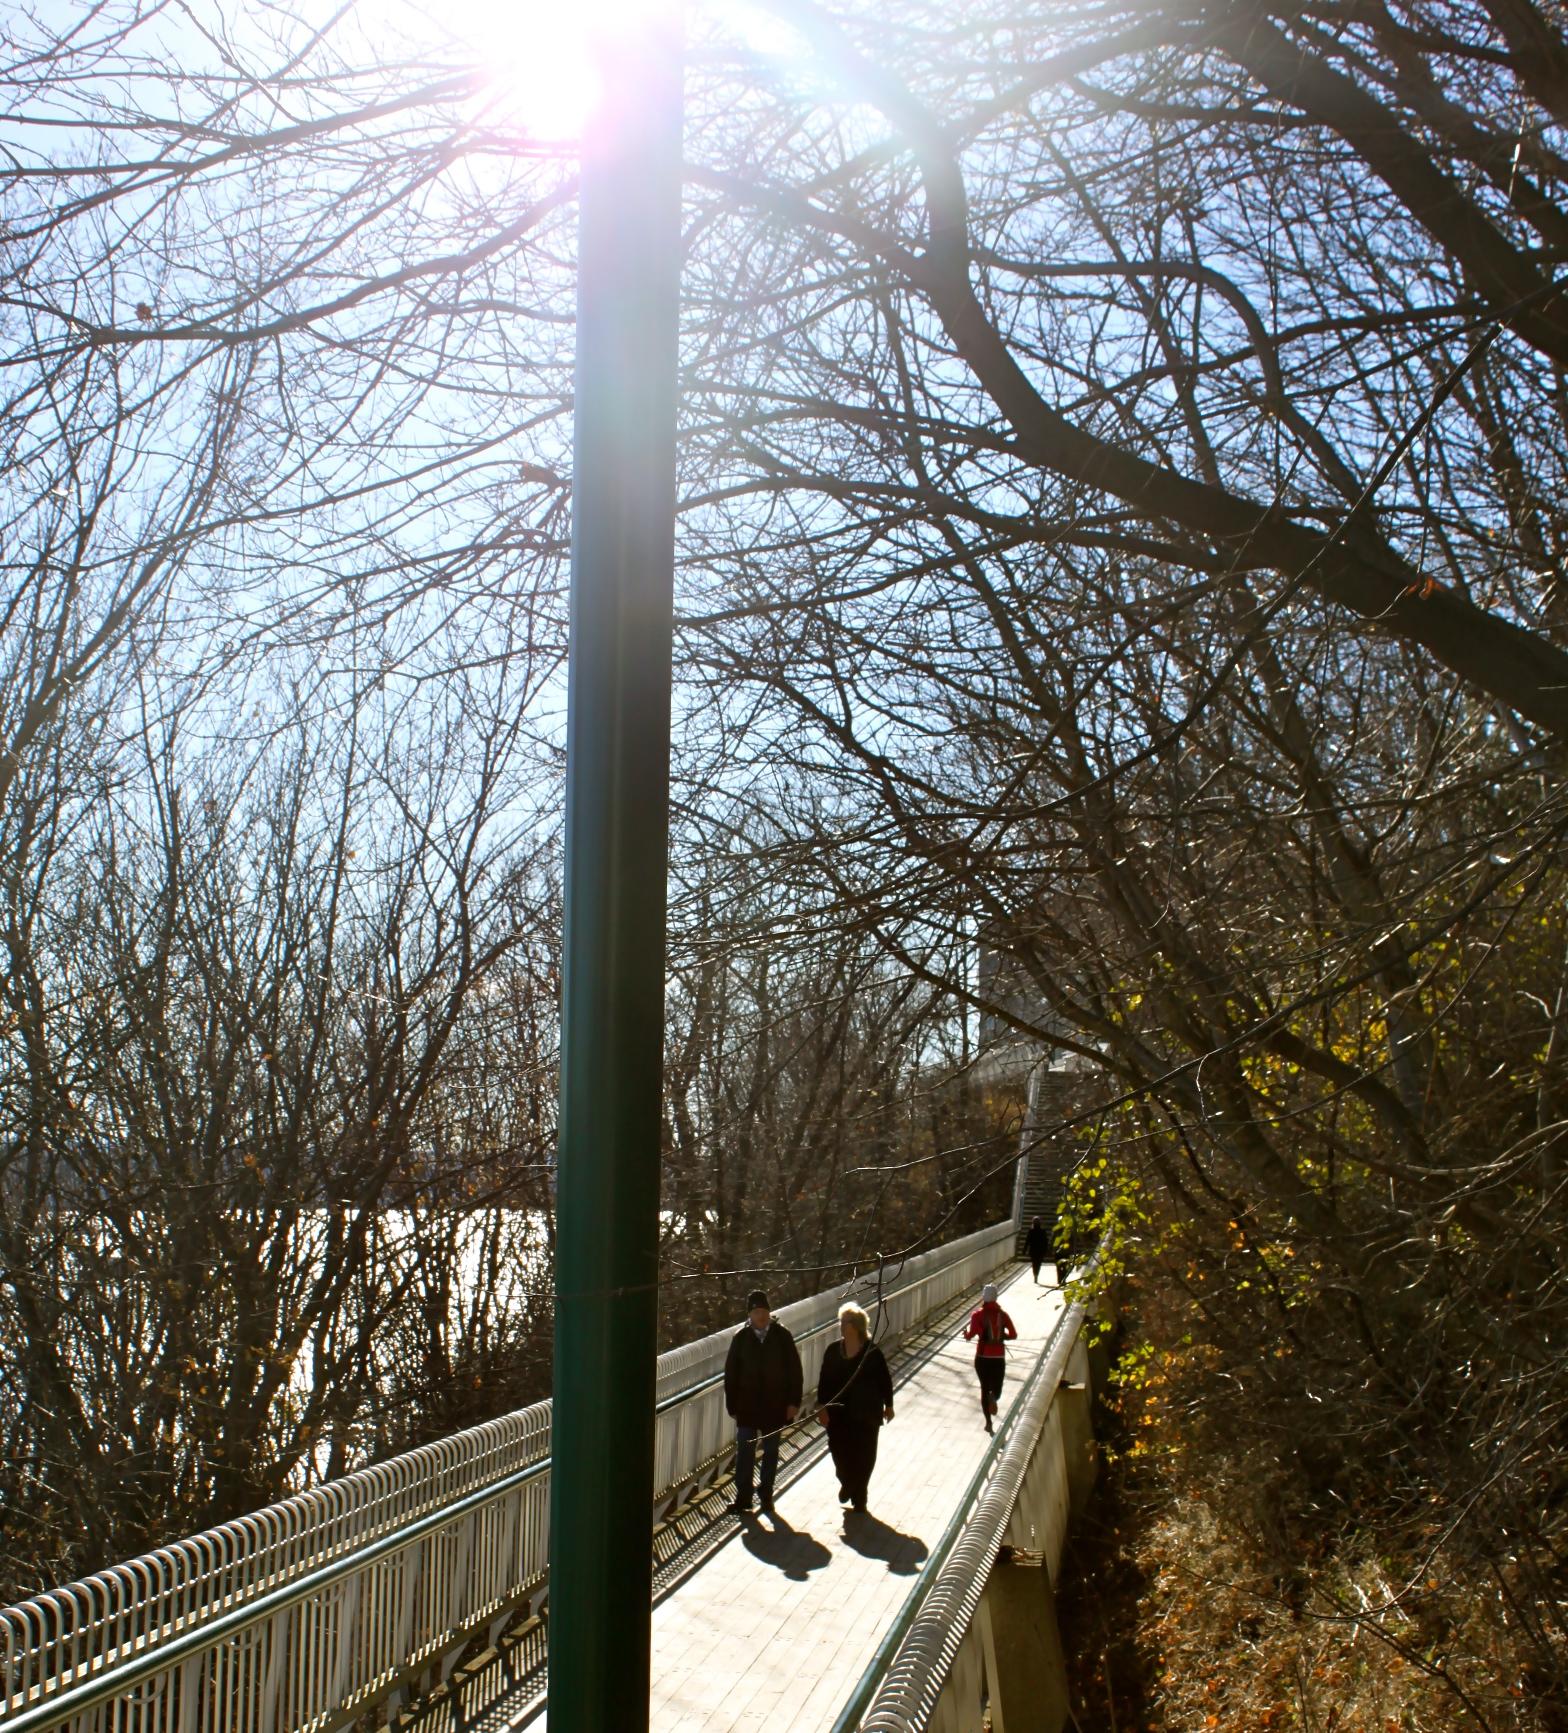 terrasse dufferin quebec city canada